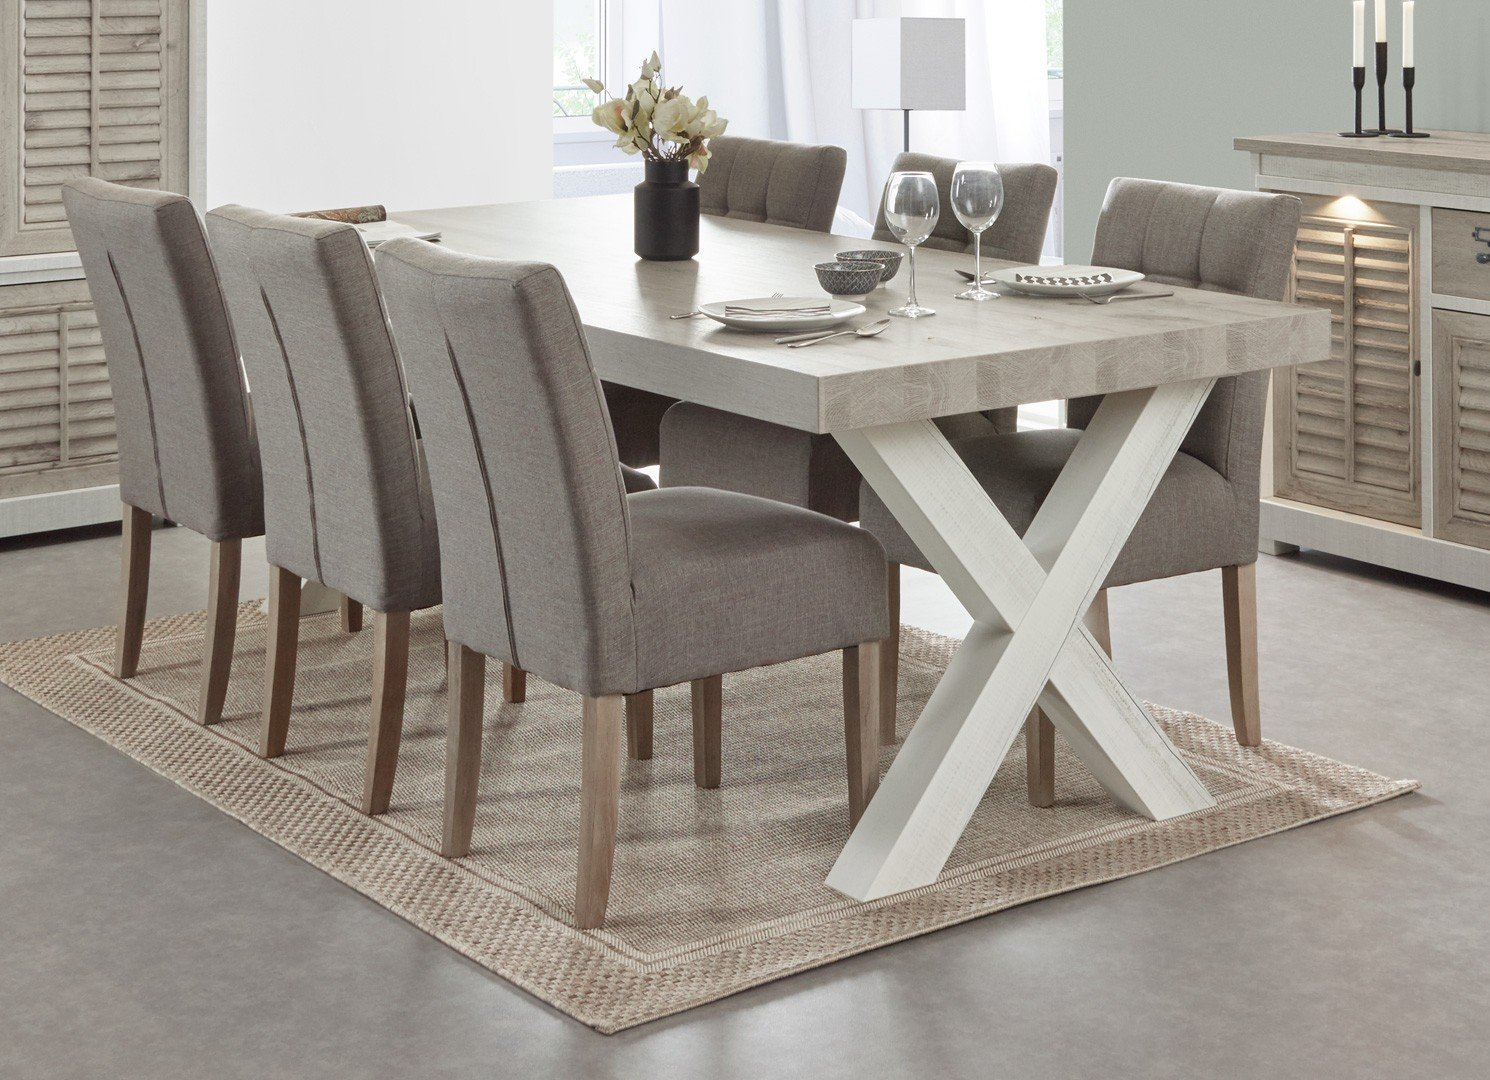 Table de salle à manger contemporaine chêne blanchi/chêne marron clair Honduras